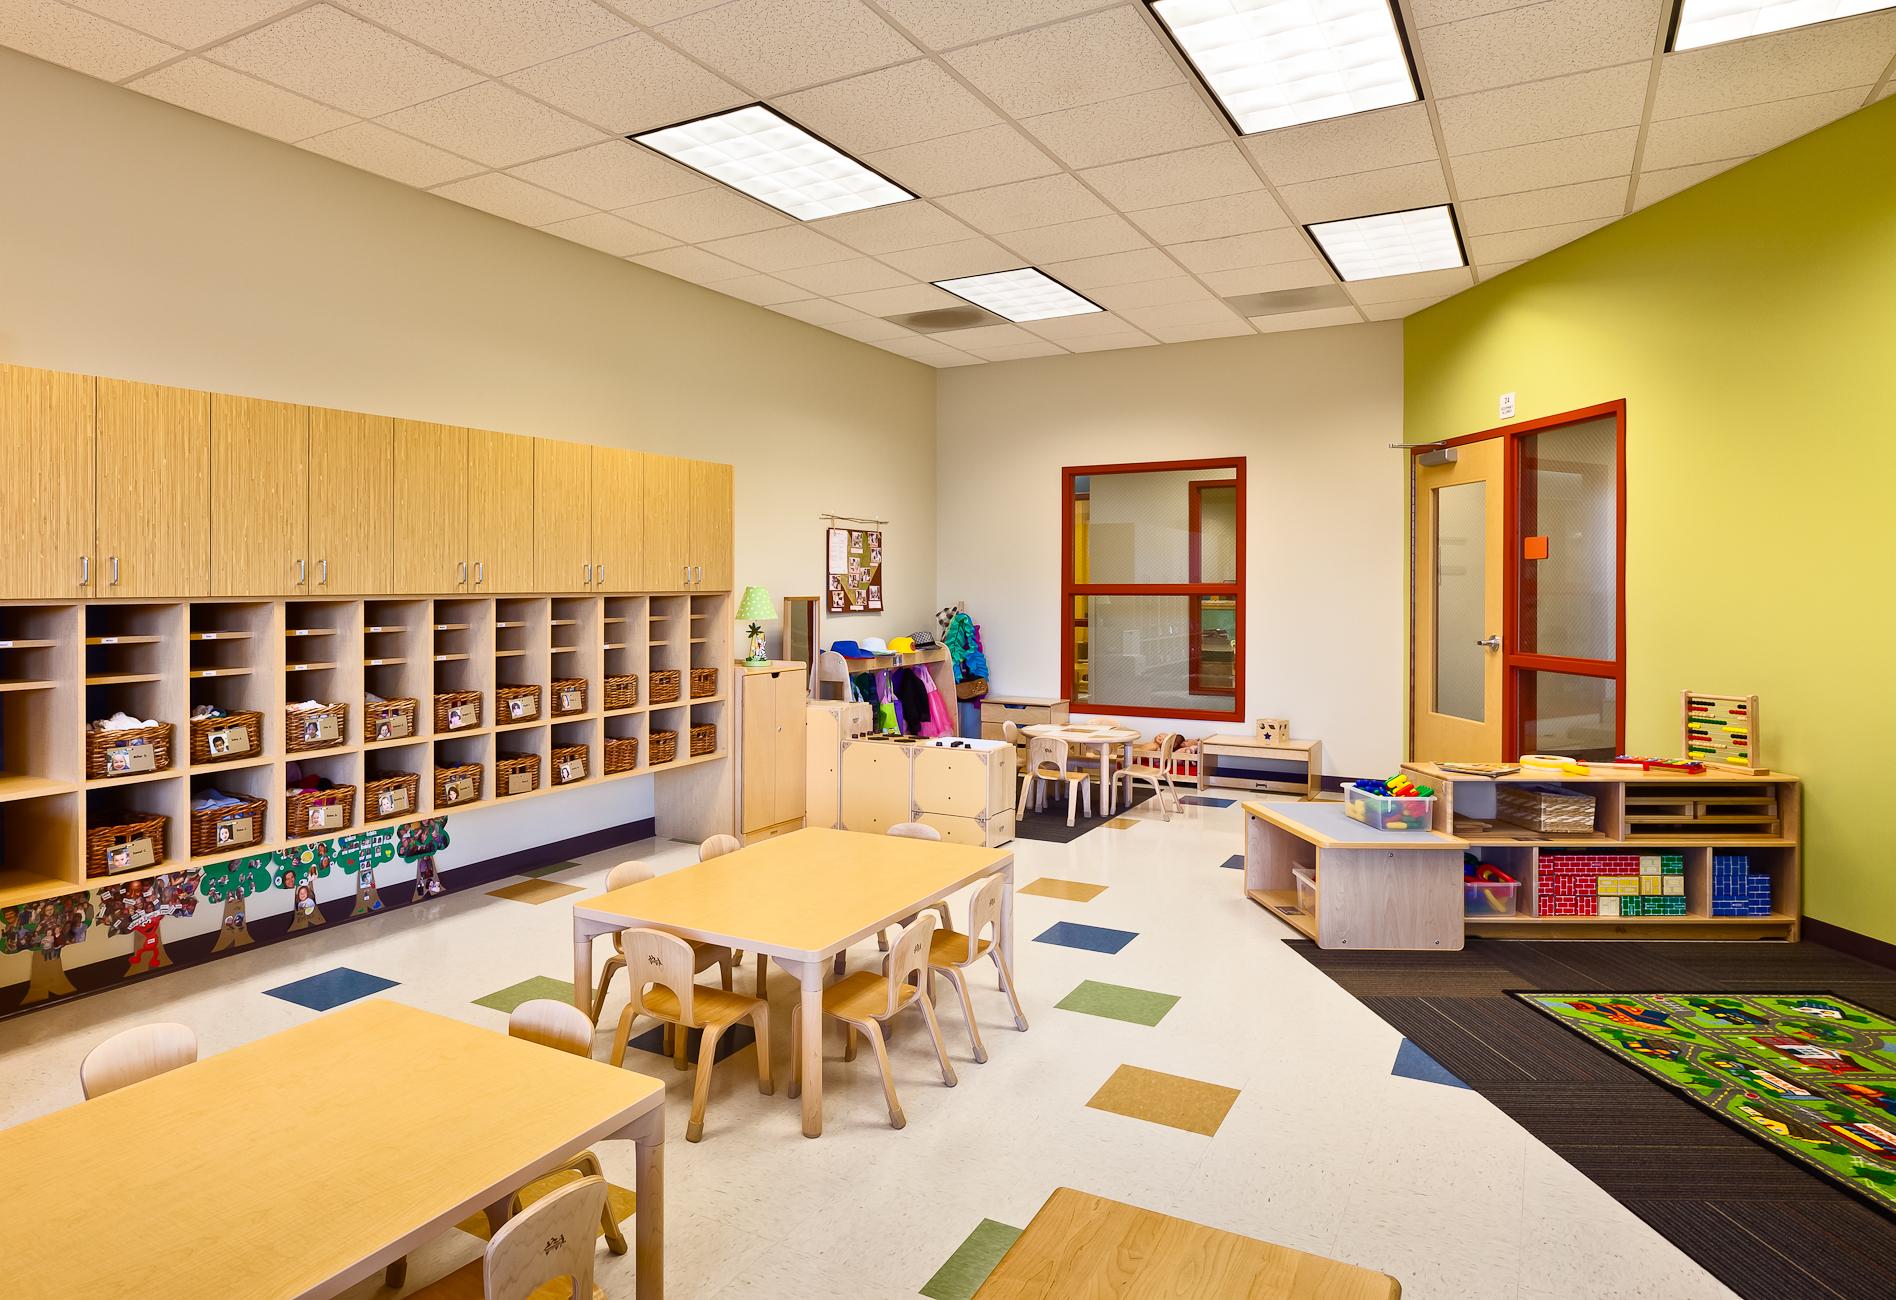 Ucla Childcare Center Josh Blumer Archinect